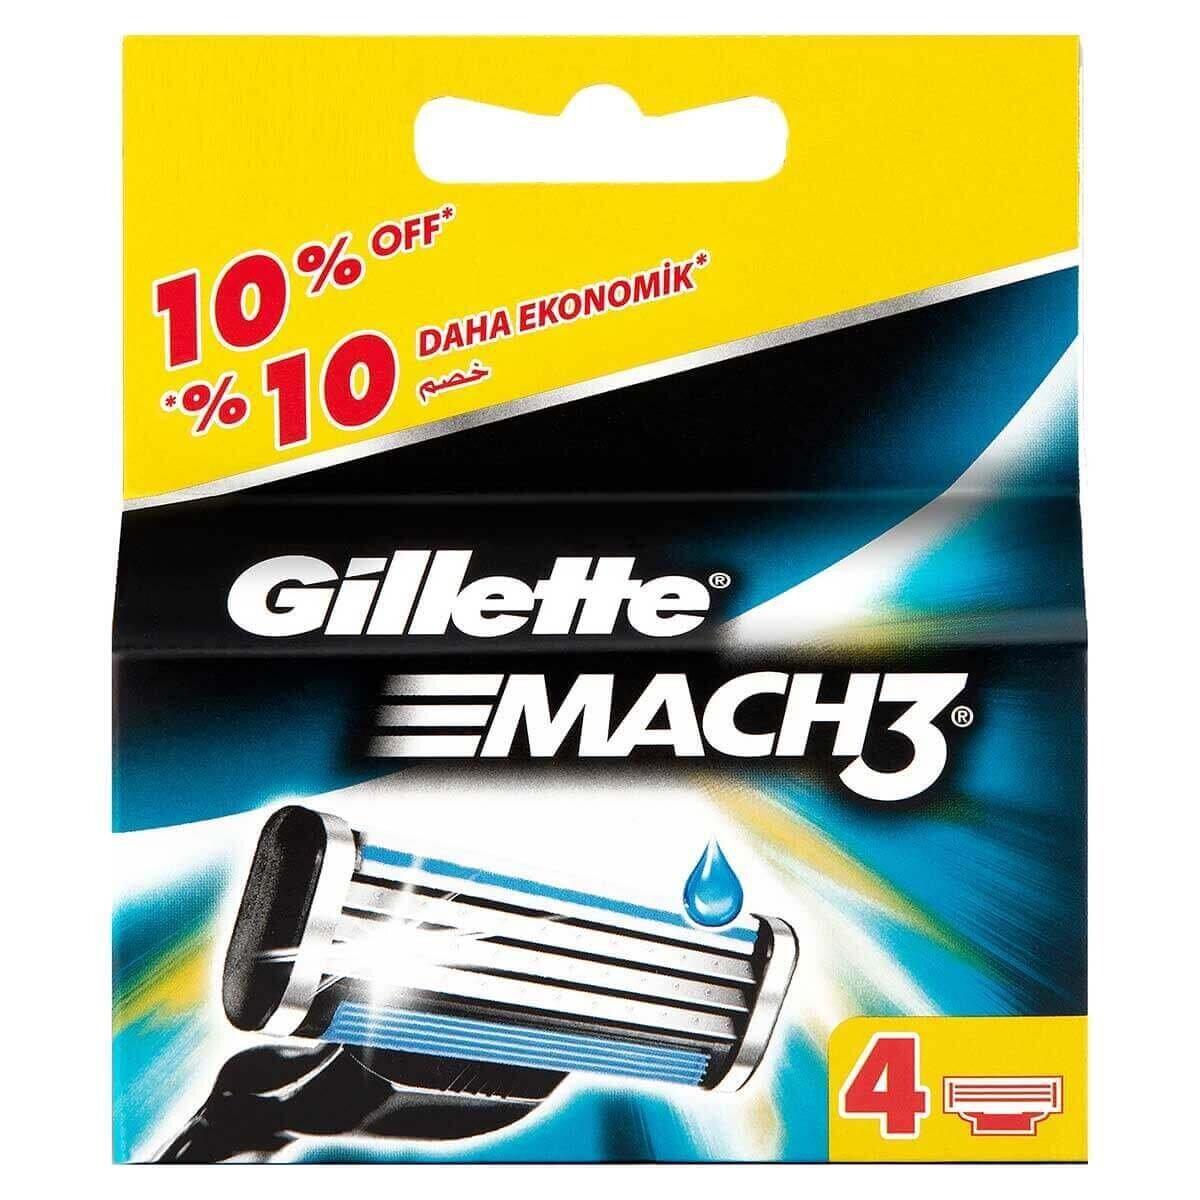 Mach3 Yedek Tıraş Bıçağı 4'lü